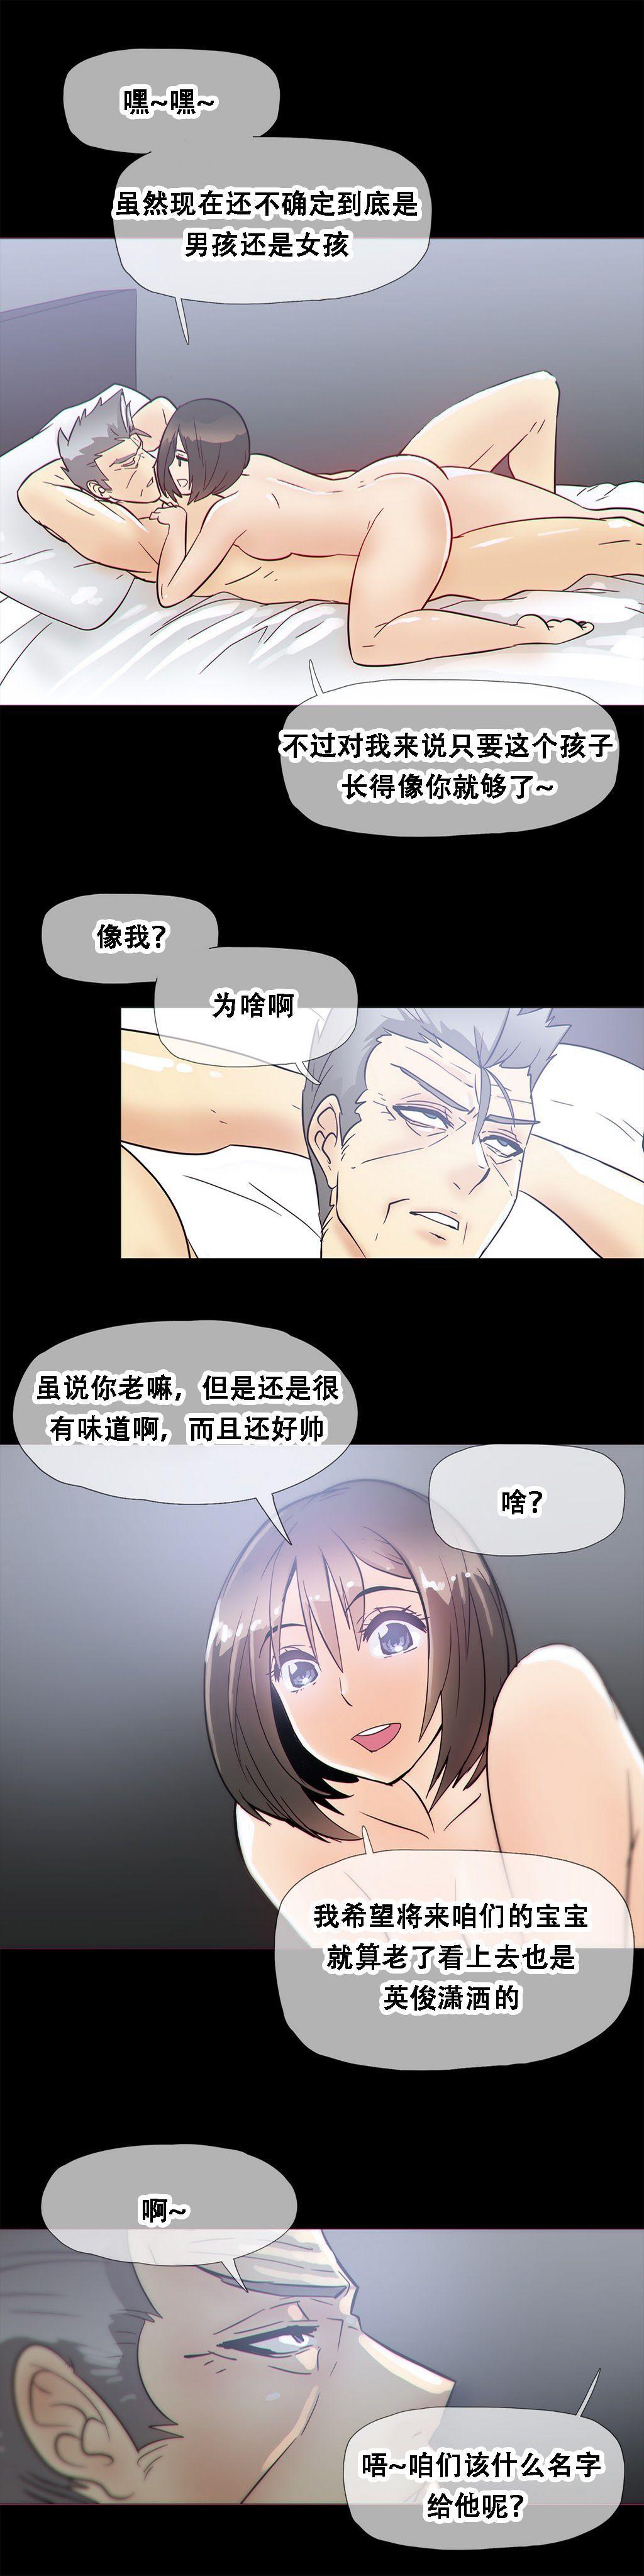 HouseHold Affairs 【卞赤鲤个人汉化】1~33话(持续更新中) 389